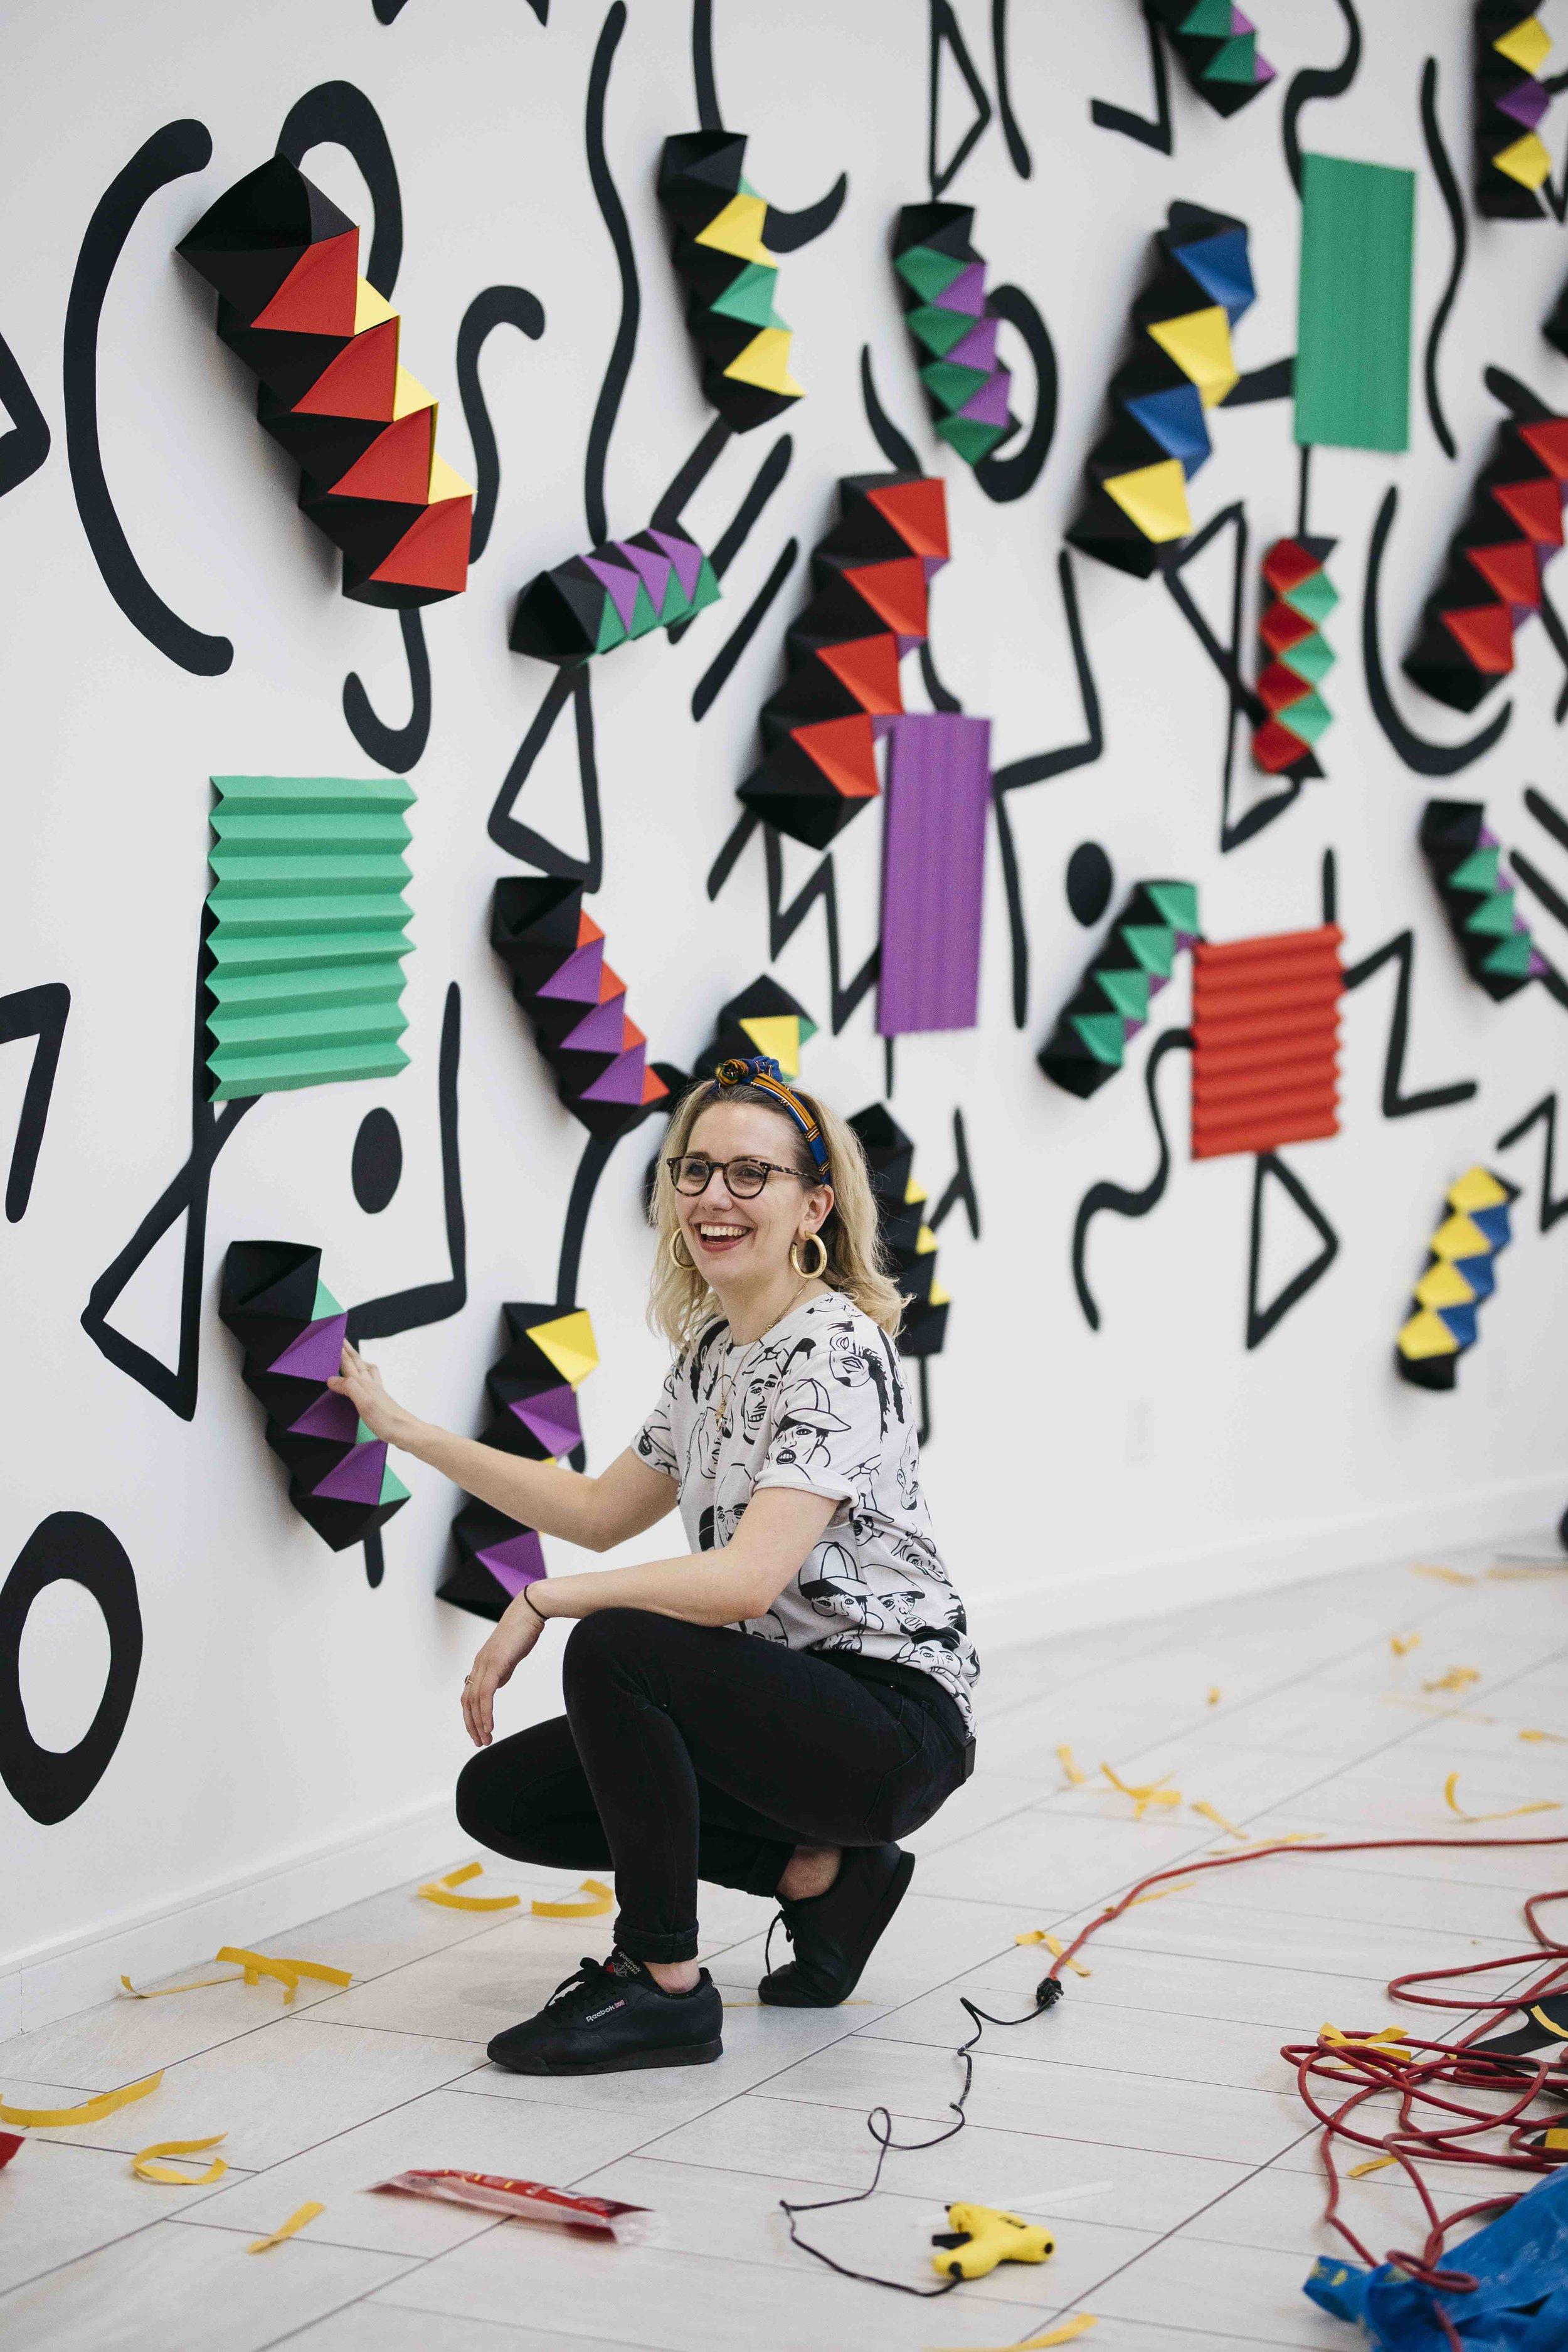 miss cloudy pauline loctin ancestrale paper art installation origami mural wall 10.jpg